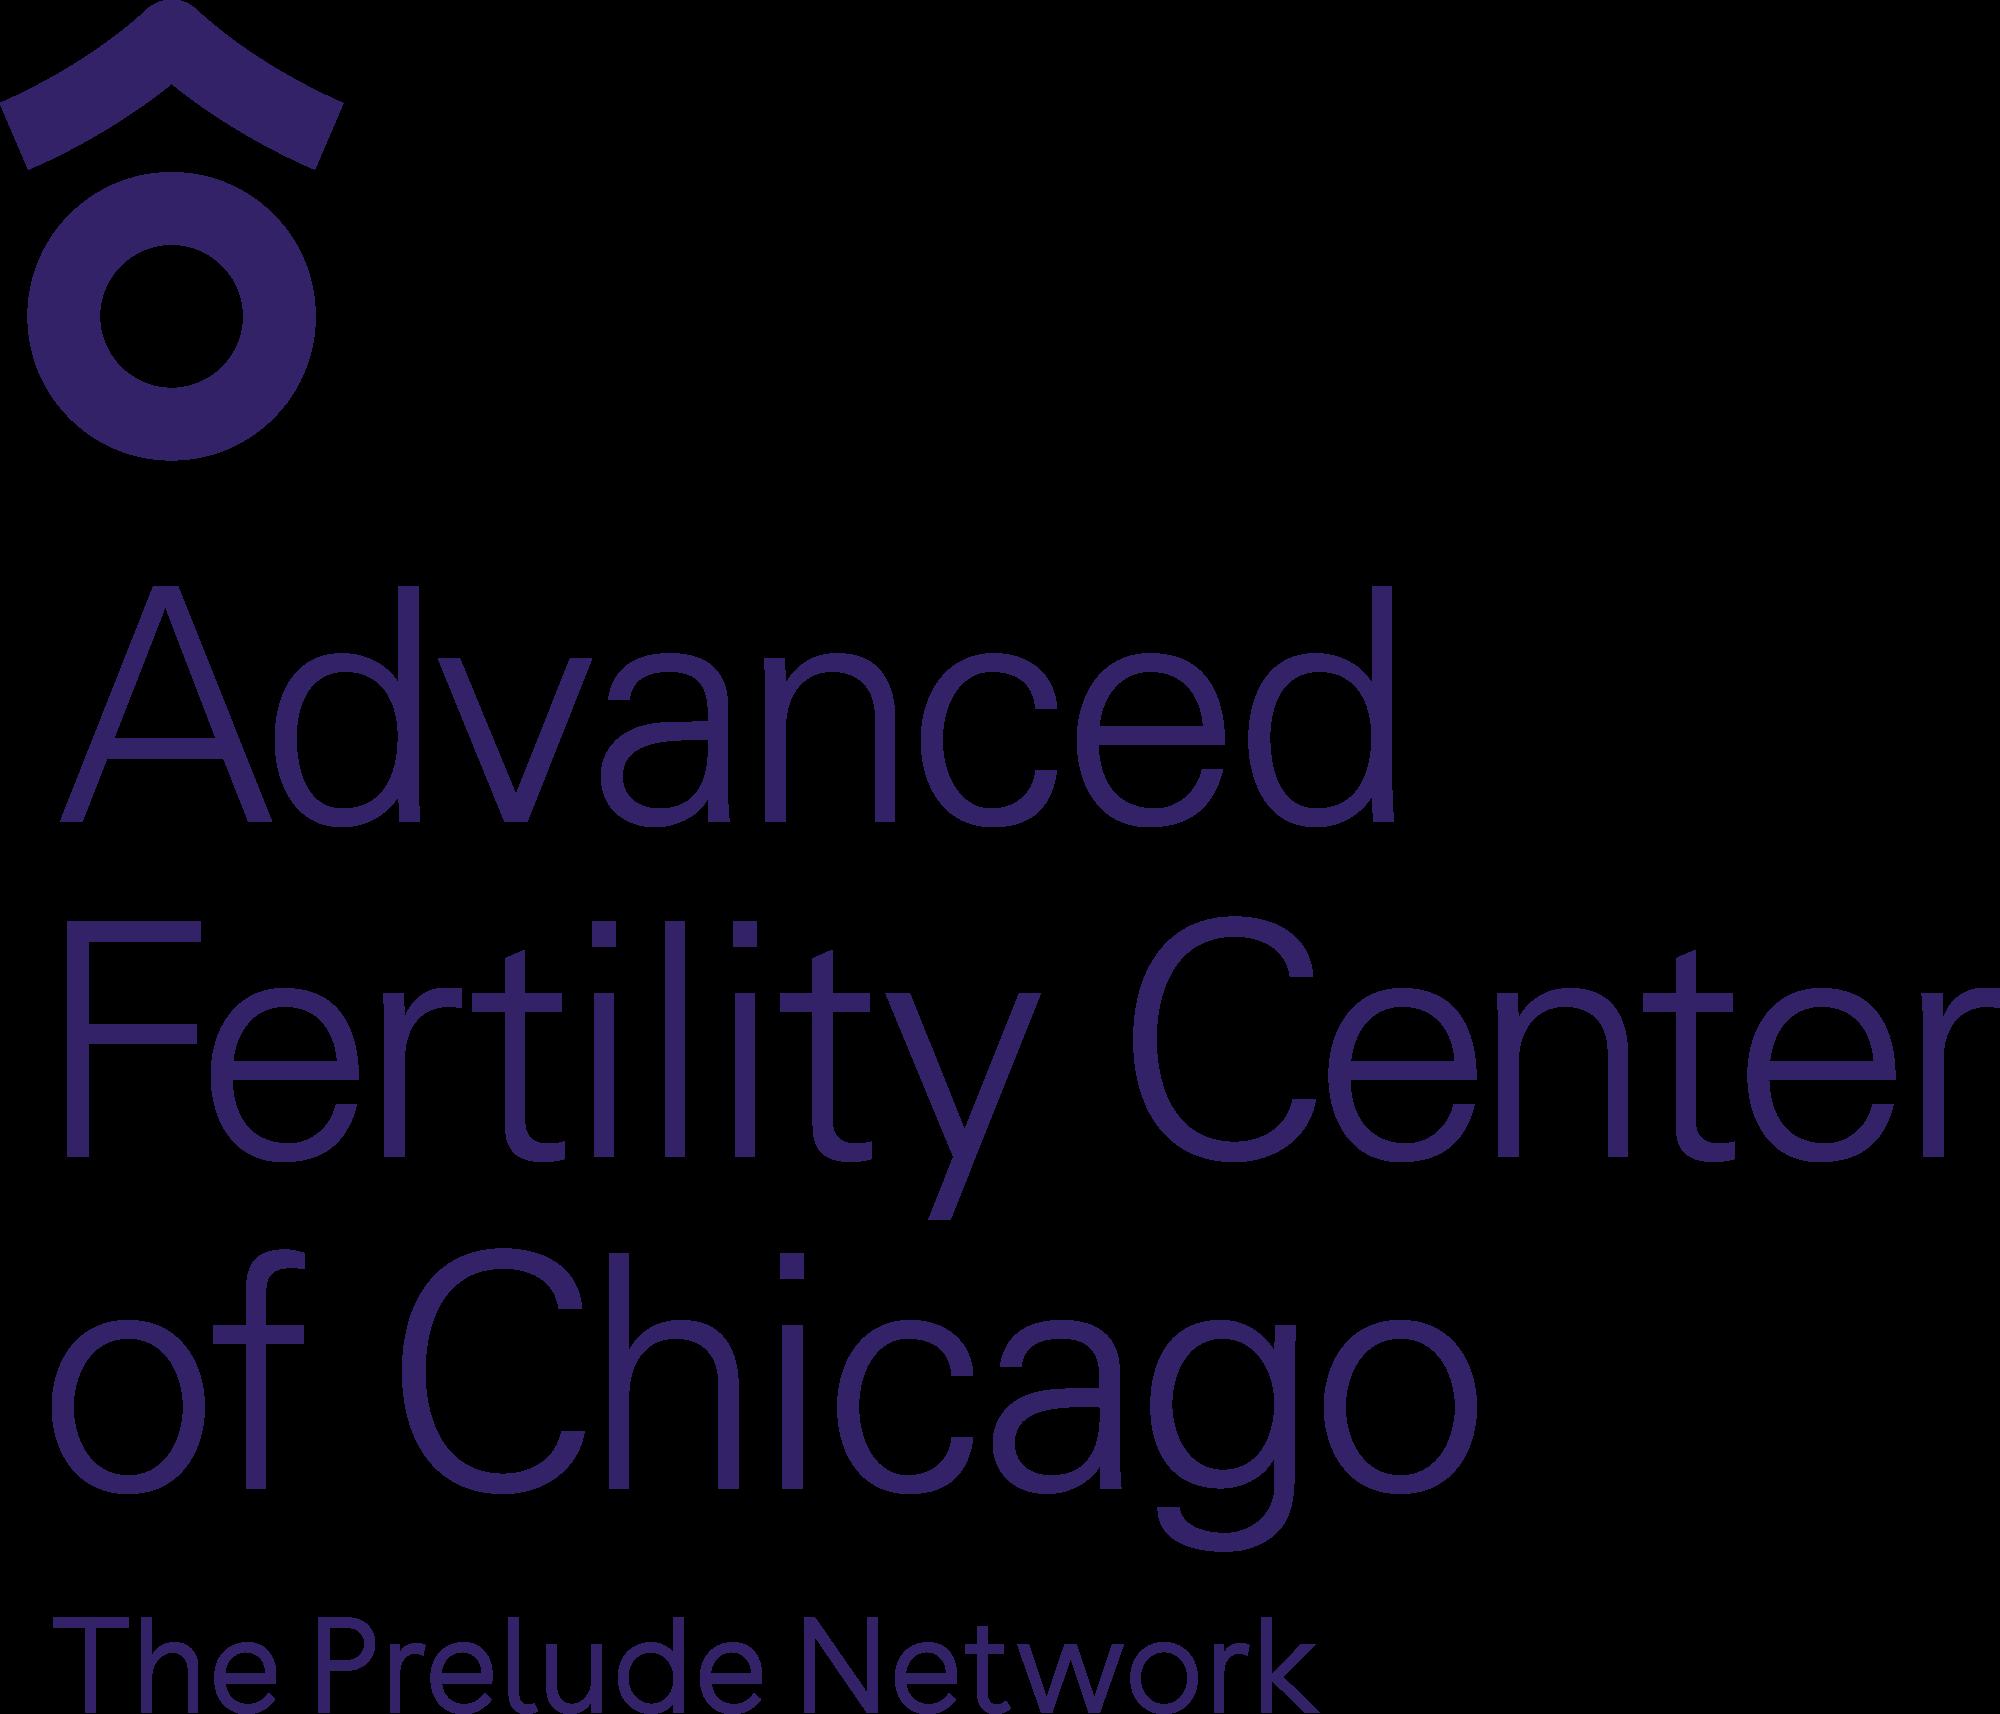 Advanced Fertility Center Of Chicago